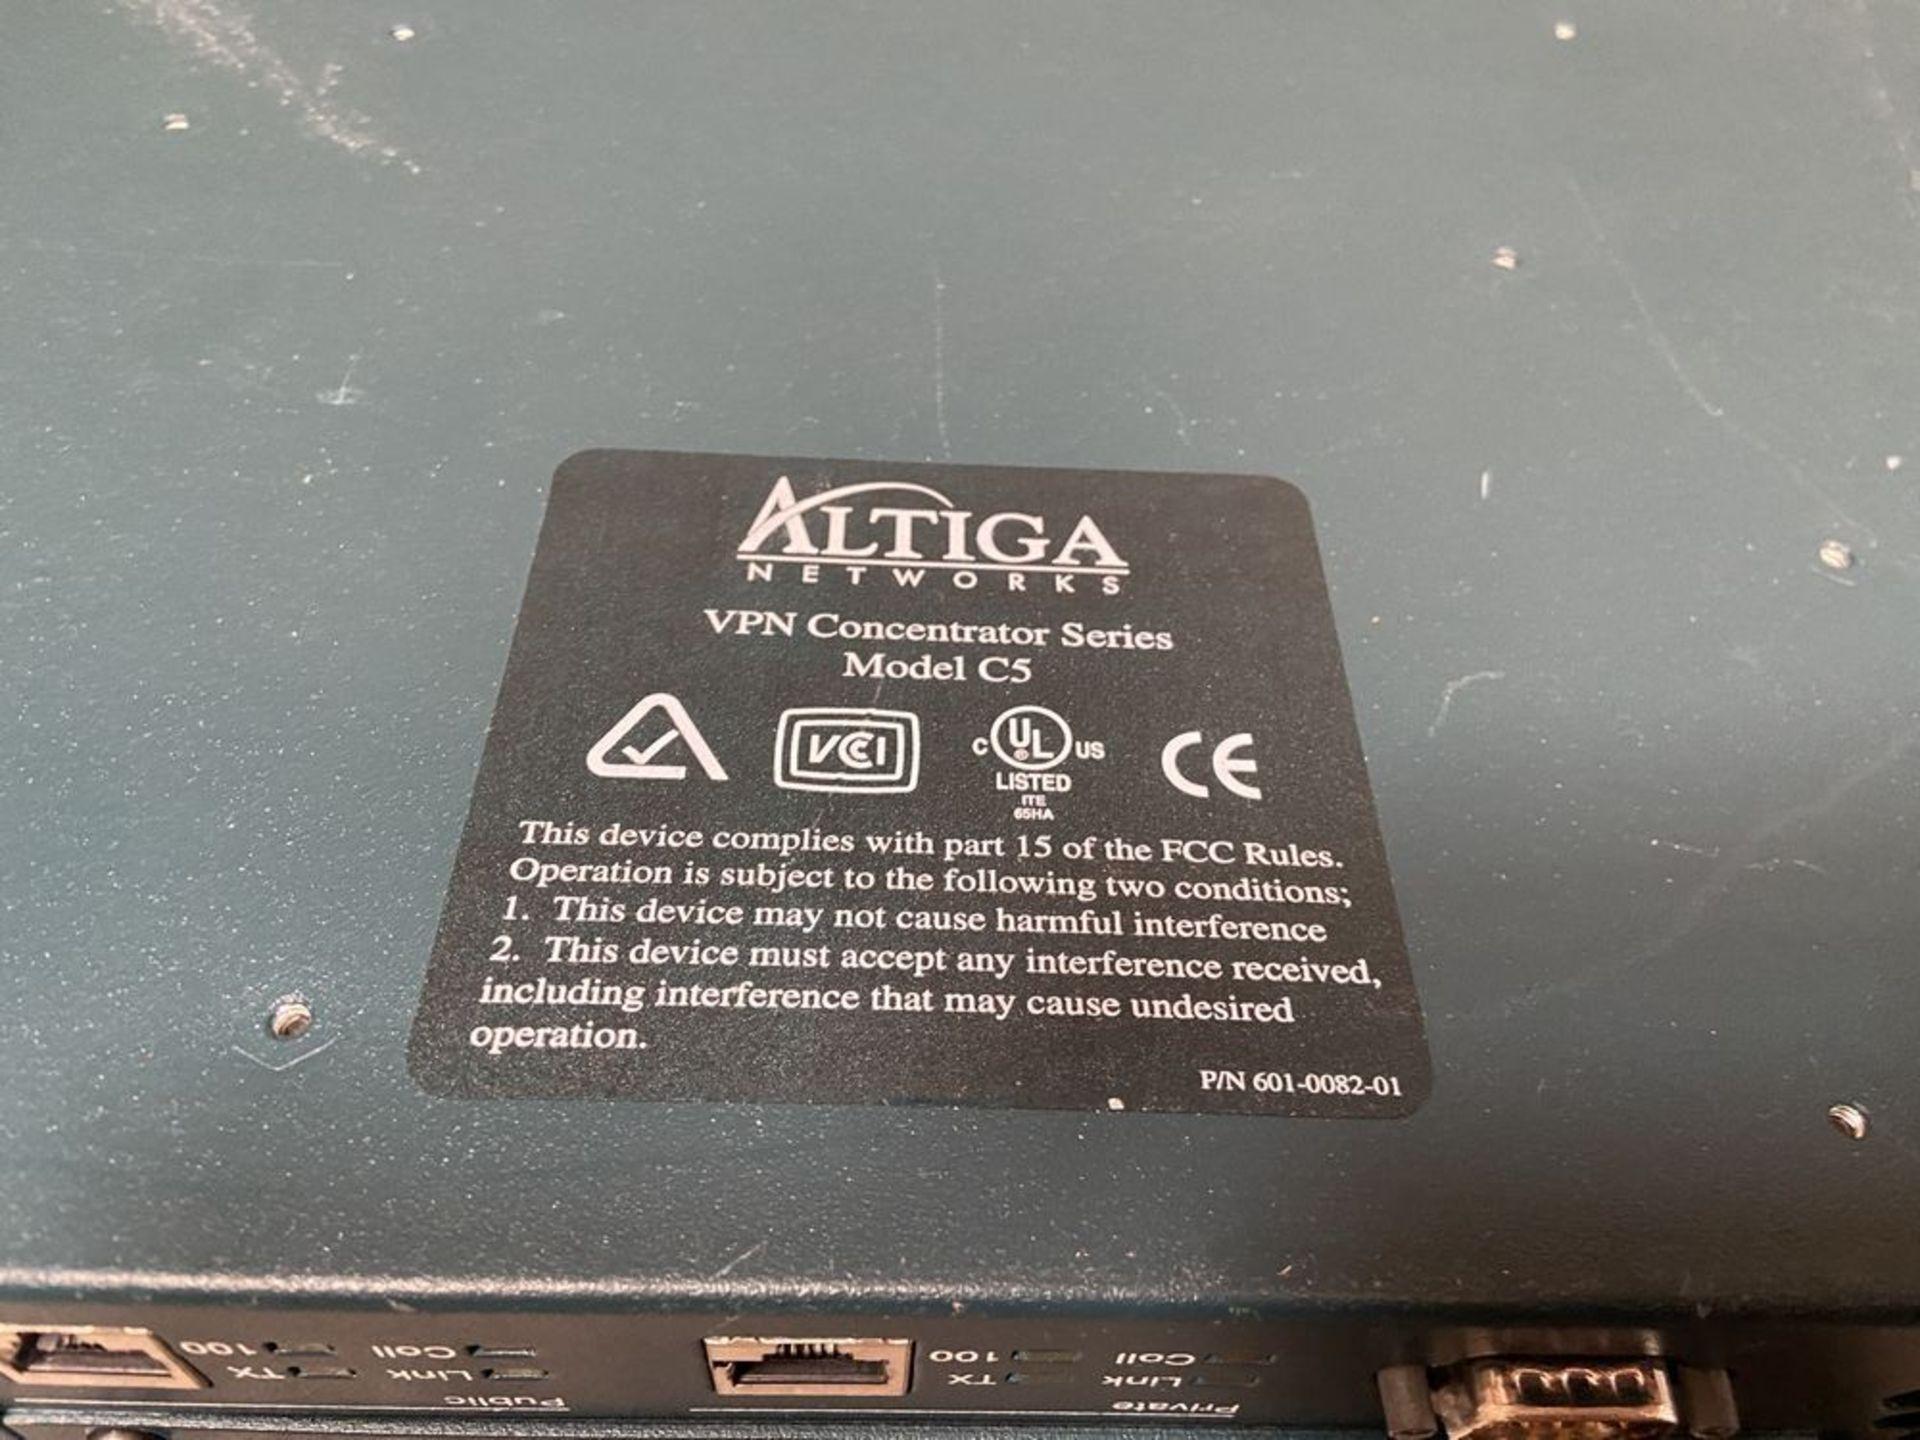 Altiga VPN Concentrator Series Model C5 - Image 8 of 8